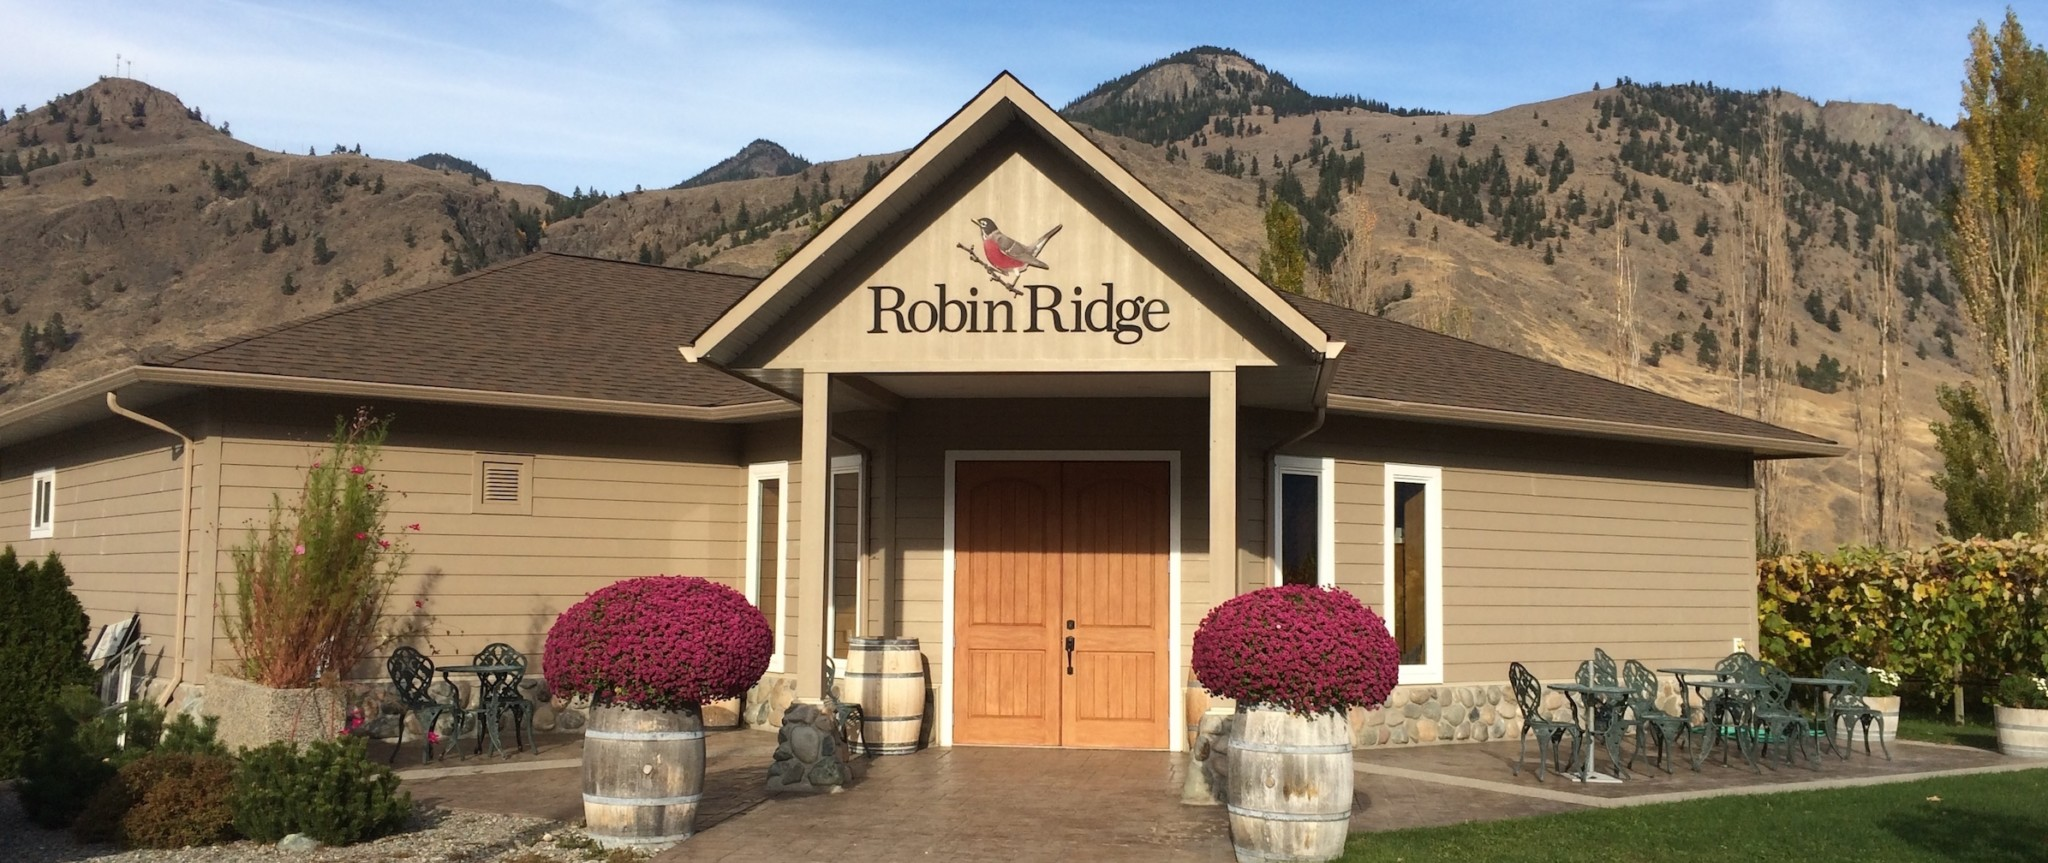 #MarketMonday featuring Robin Ridge Winery